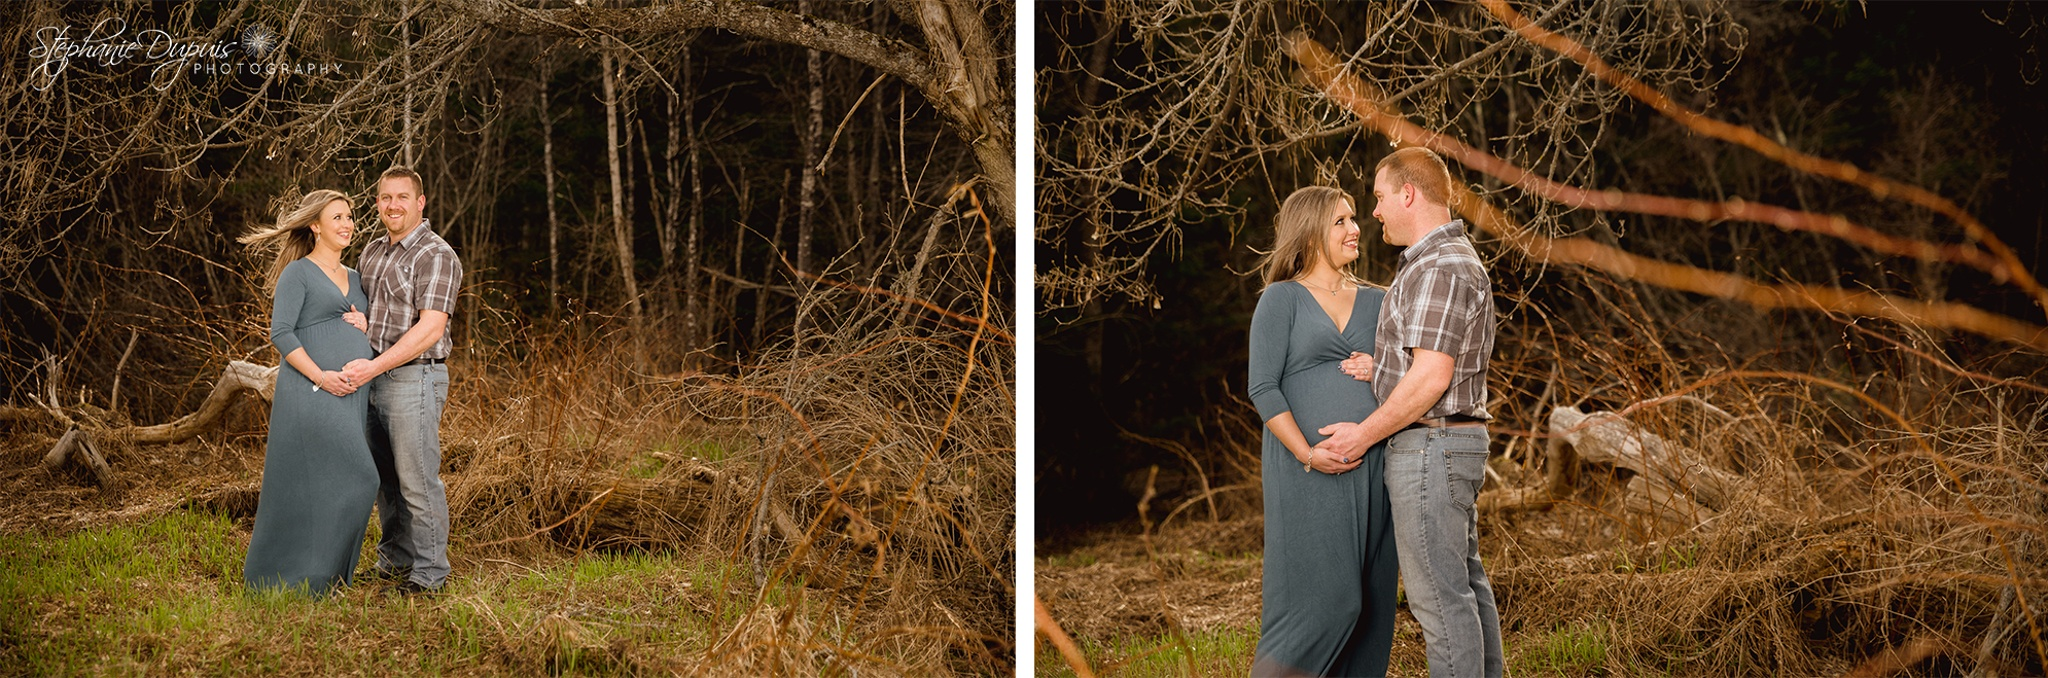 Chelsea Maternity 10 - Portfolio: Chelsea's Maternity Session